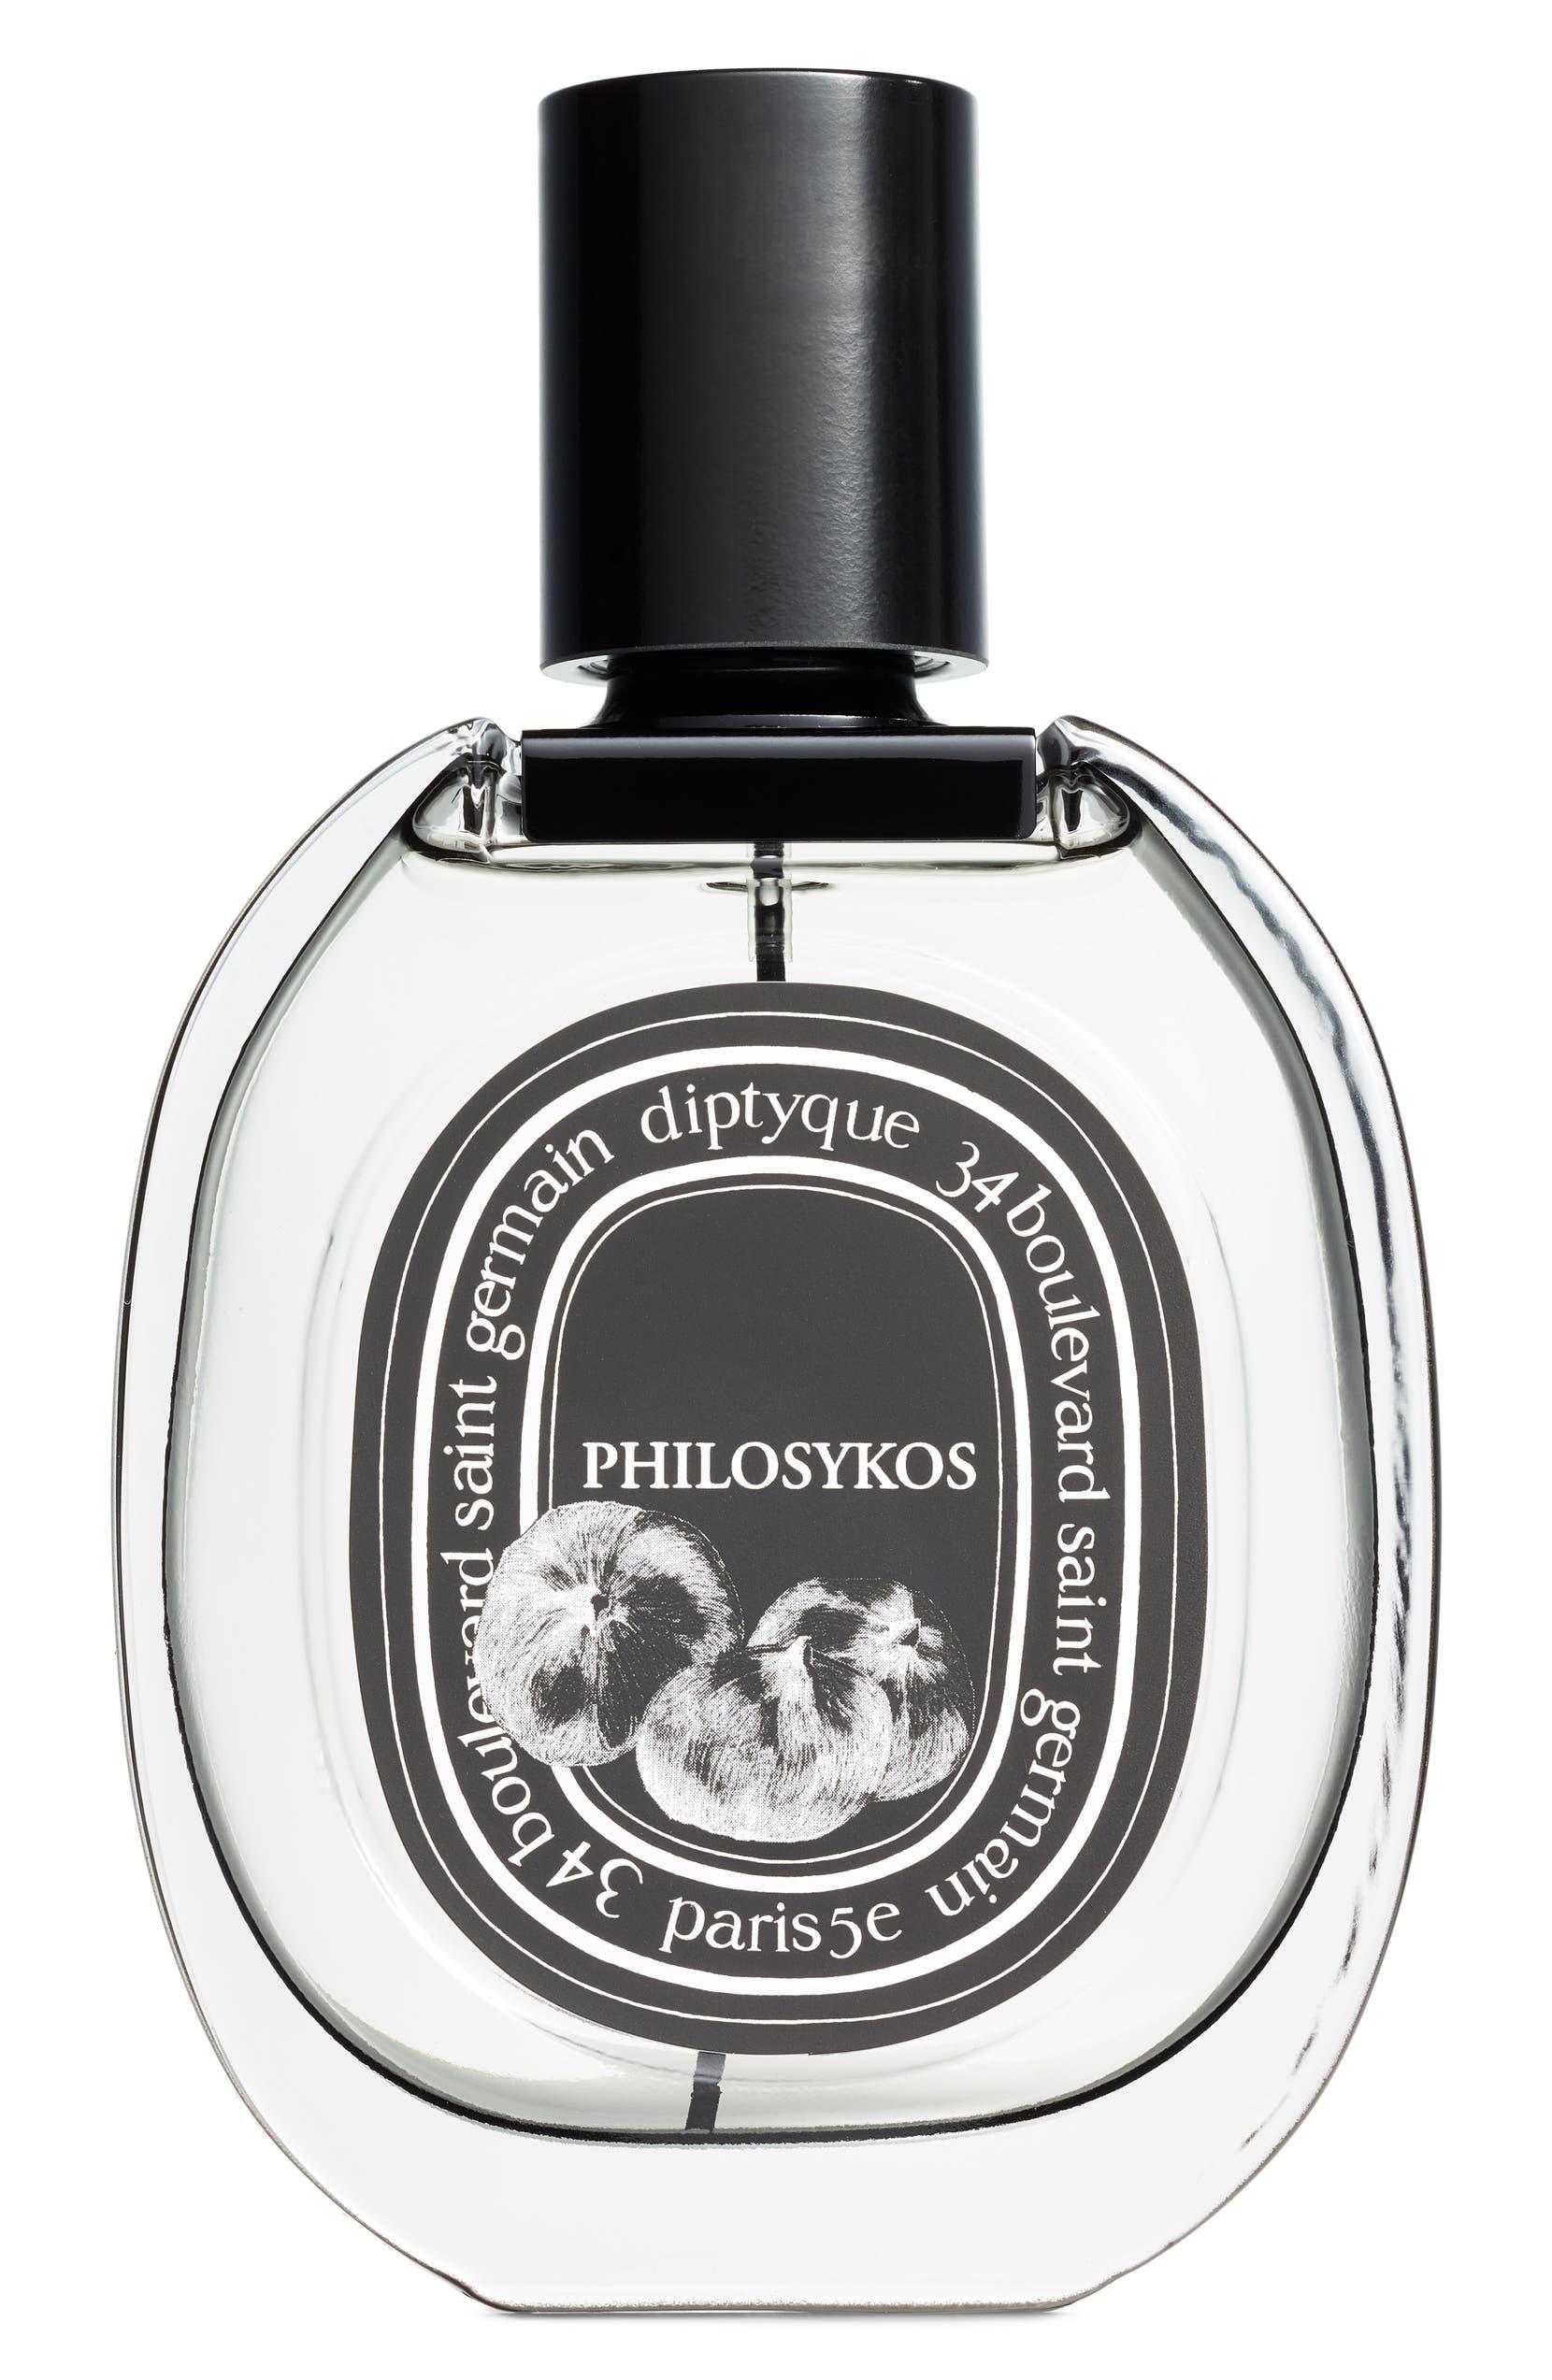 Diptyque Philosykos Eau De Parfum.Diptyque Philosykos Eau De Parfum Nordstrom